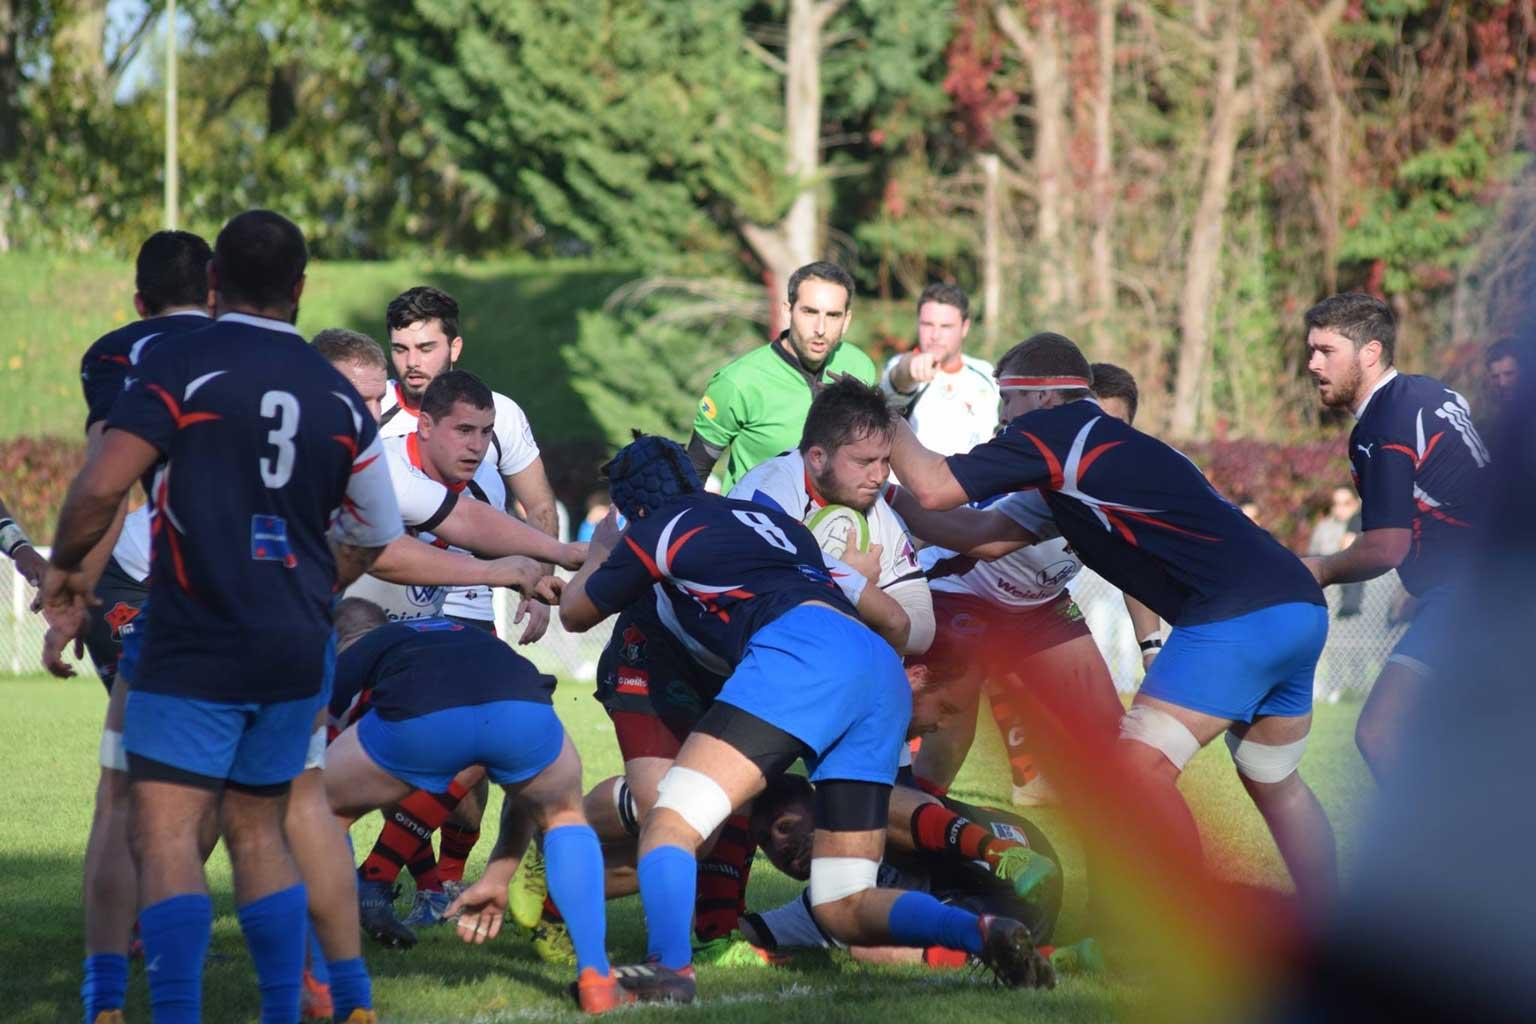 © 2018 Maeva Franco - Espoirs - Blagnac vs Graulhet - Photo 61